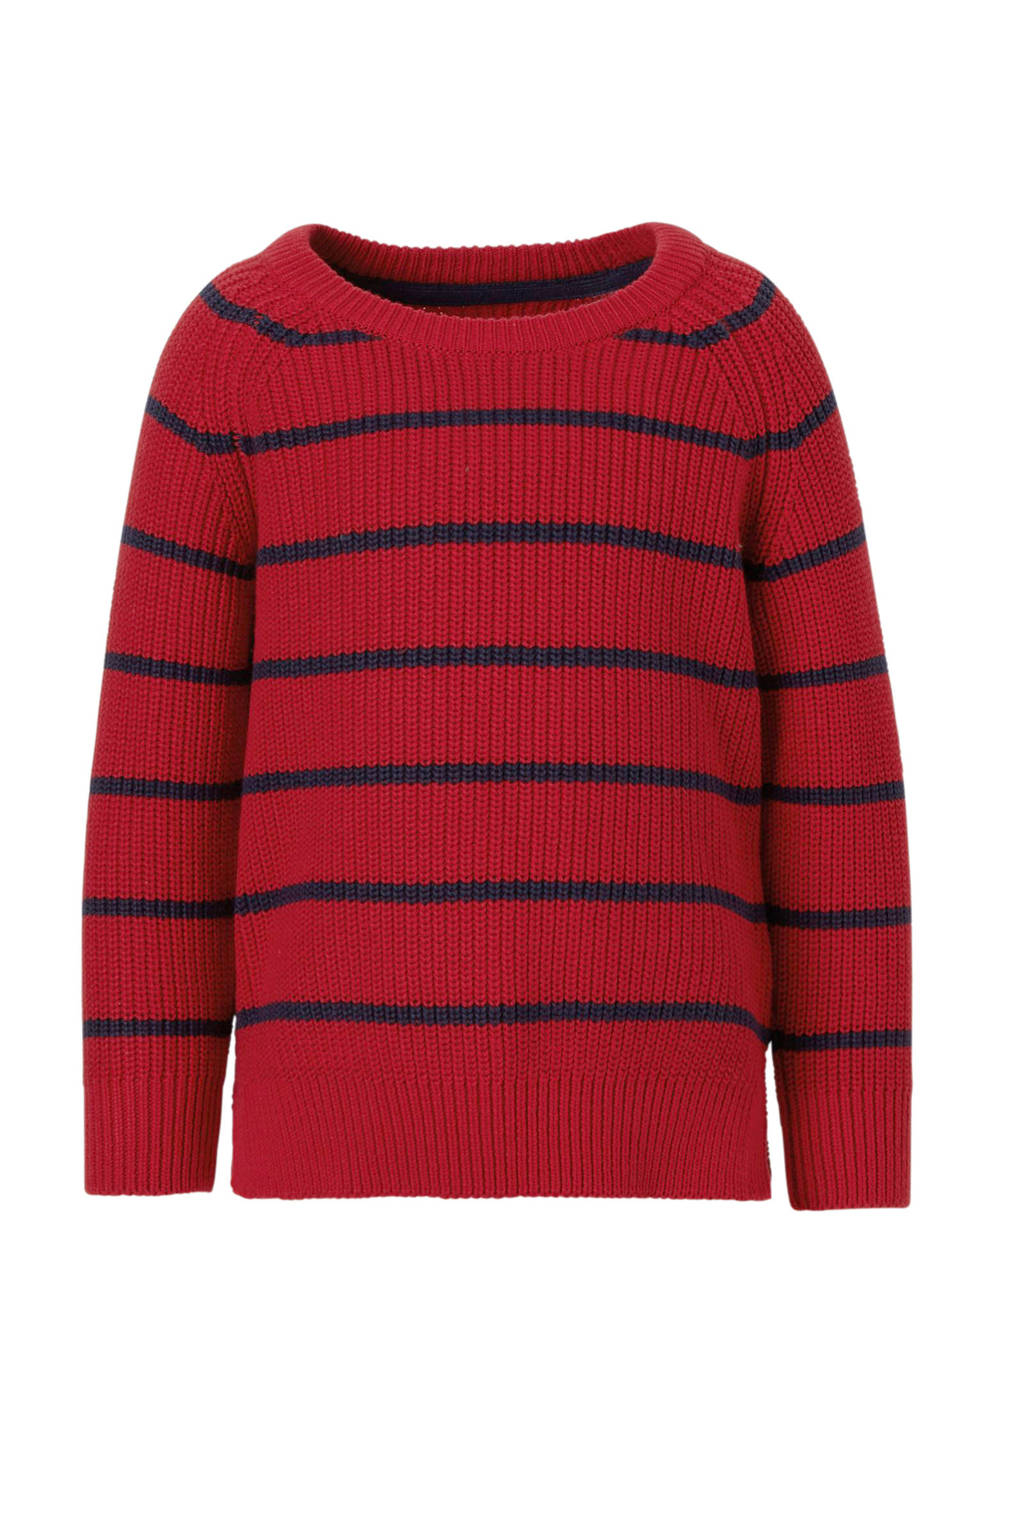 C&A Palomino gestreepte trui rood, Rood/donkerblauw